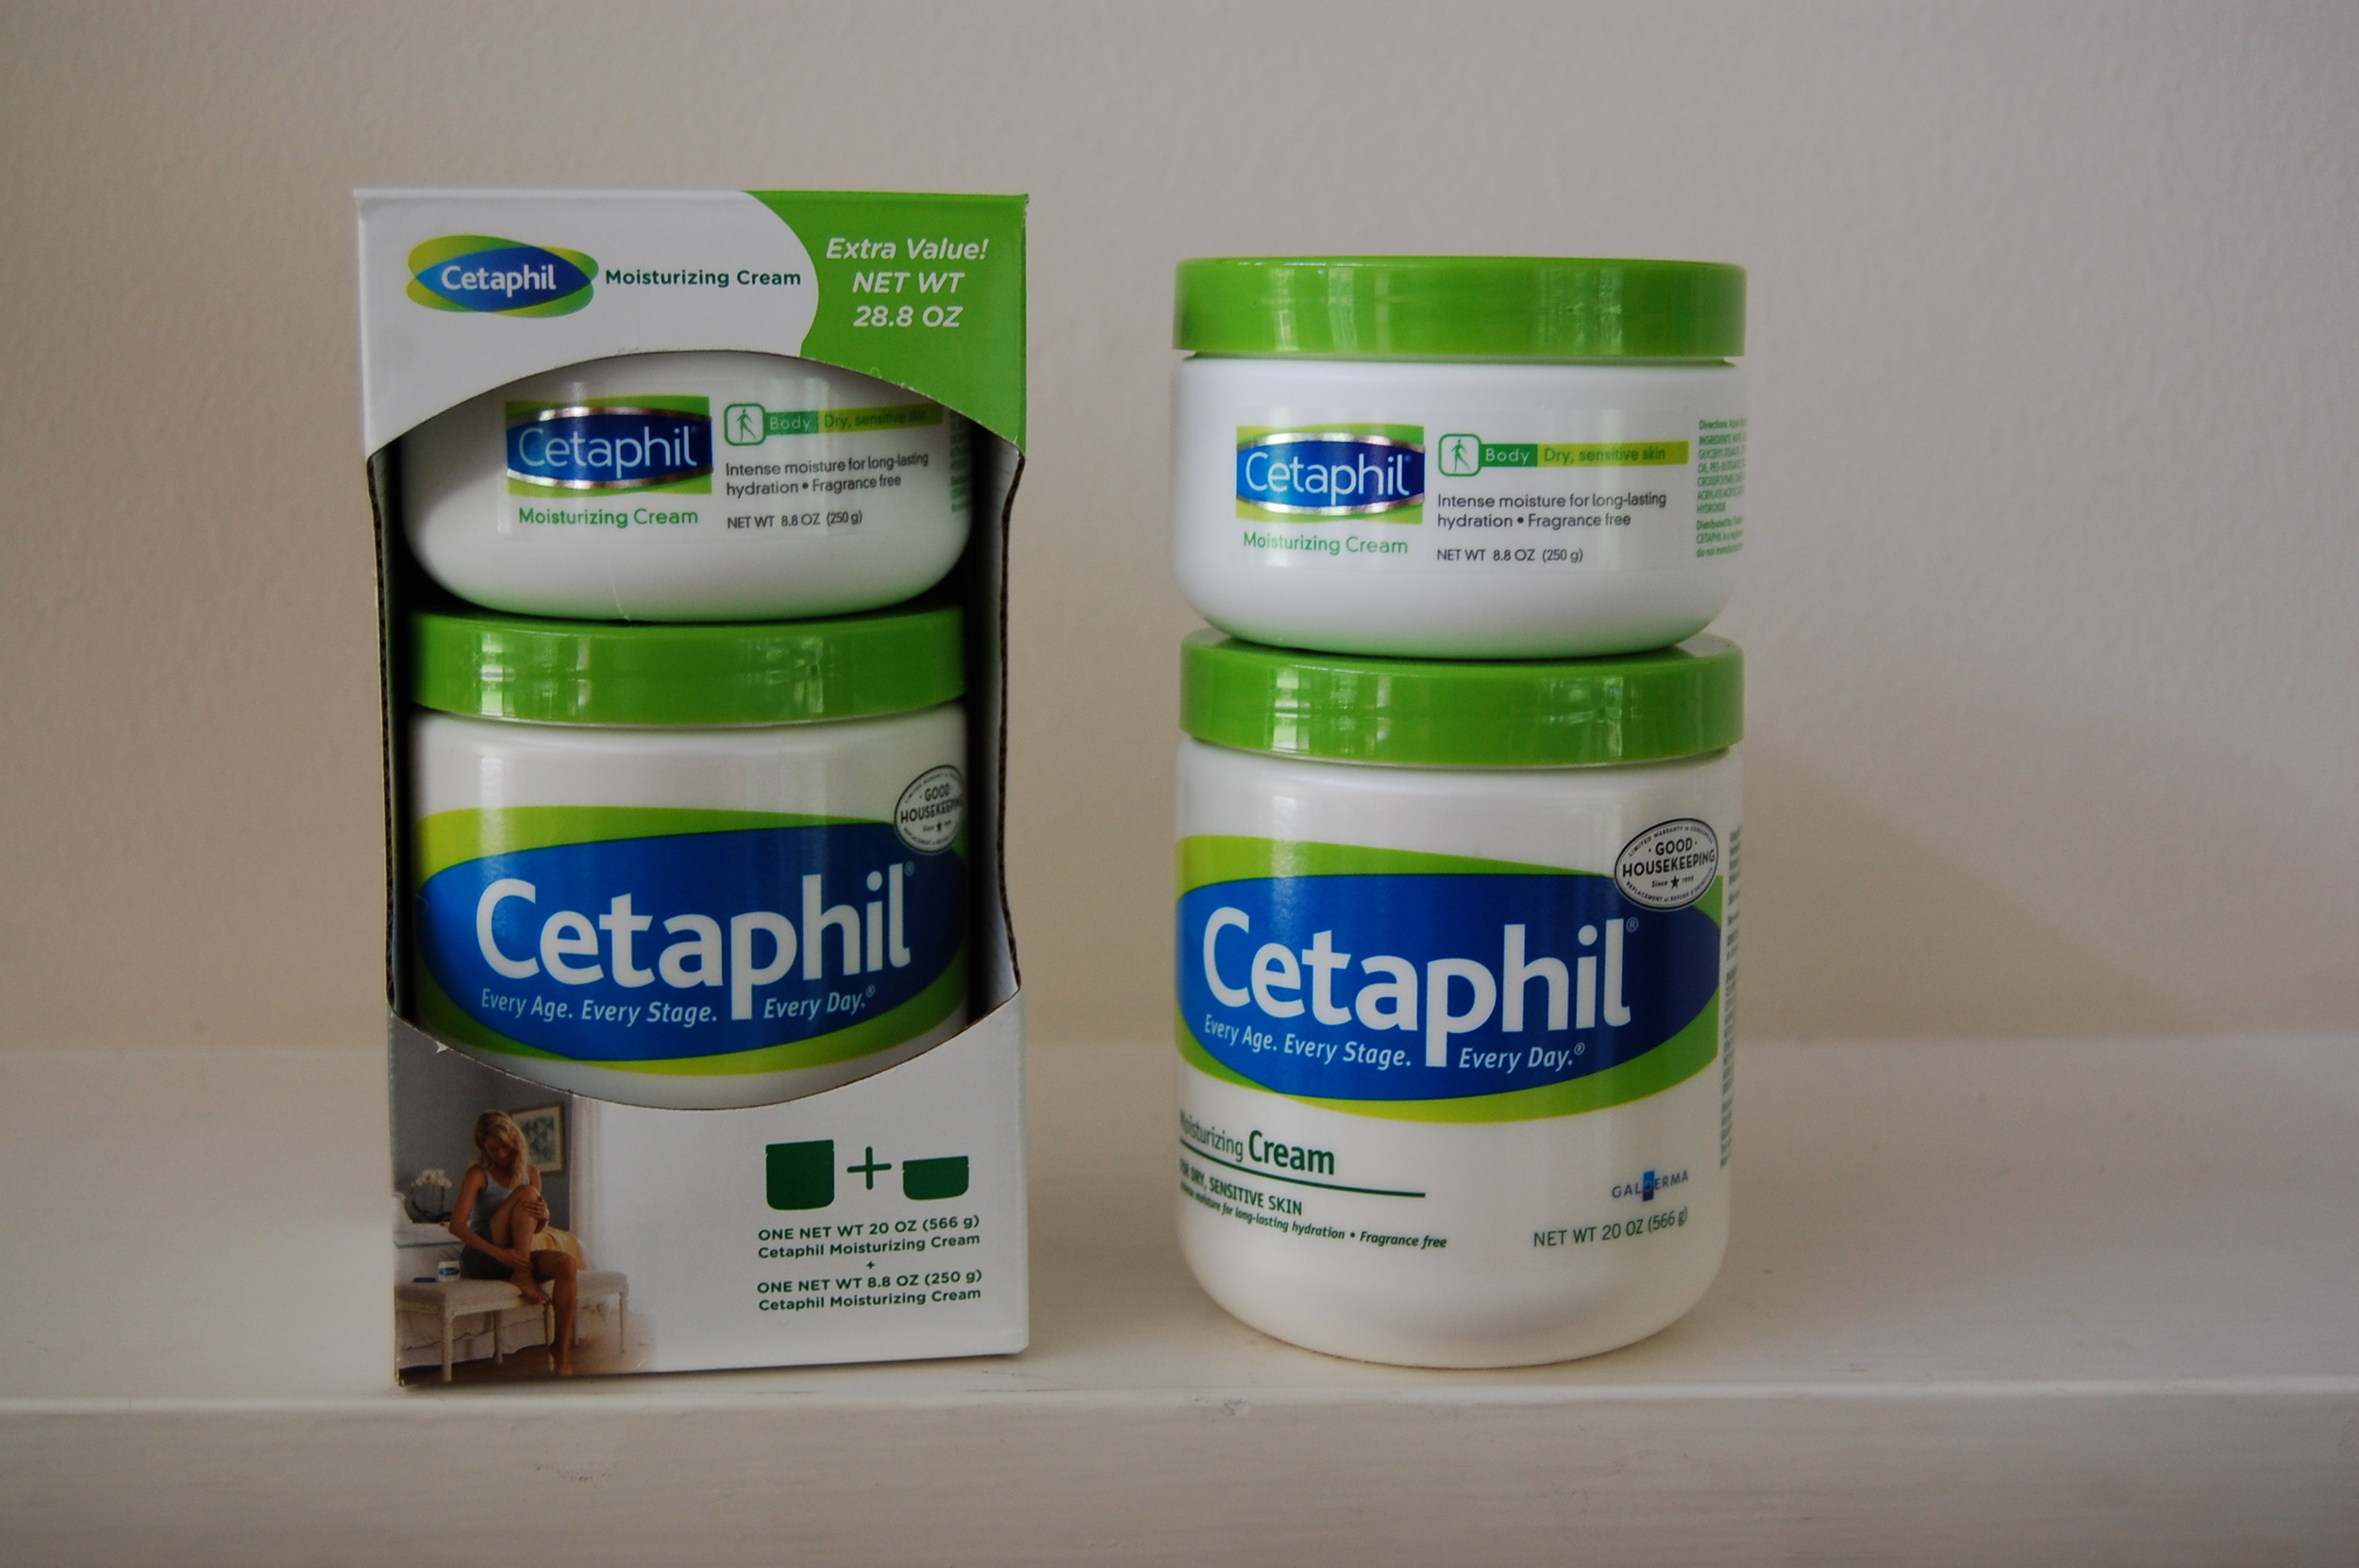 Cetaphil Moisturizing Cream, purchased at Costco.